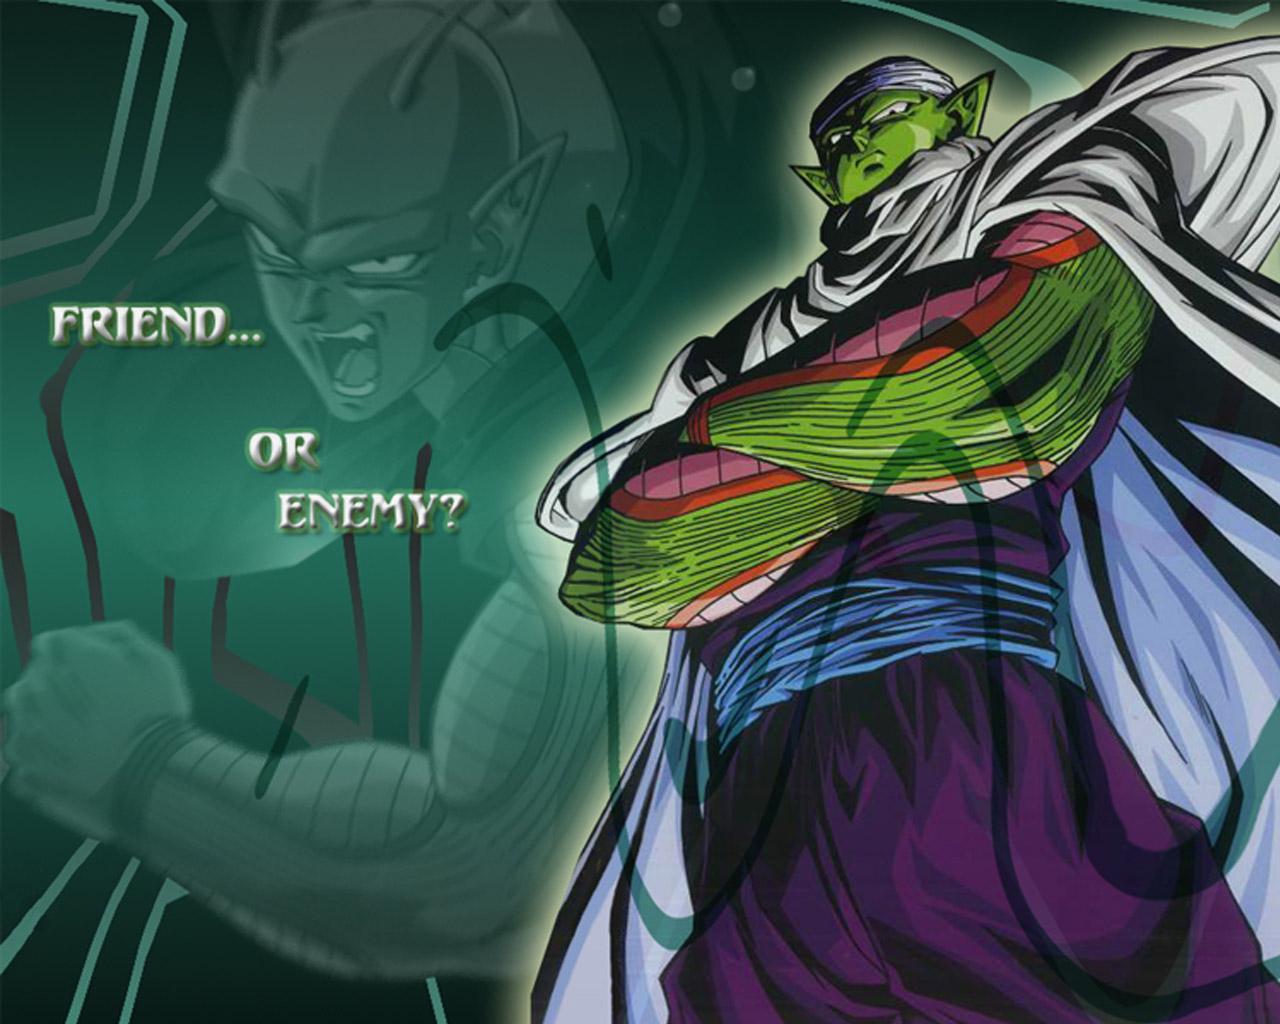 49 Dragon Ball Z Piccolo Wallpaper On Wallpapersafari